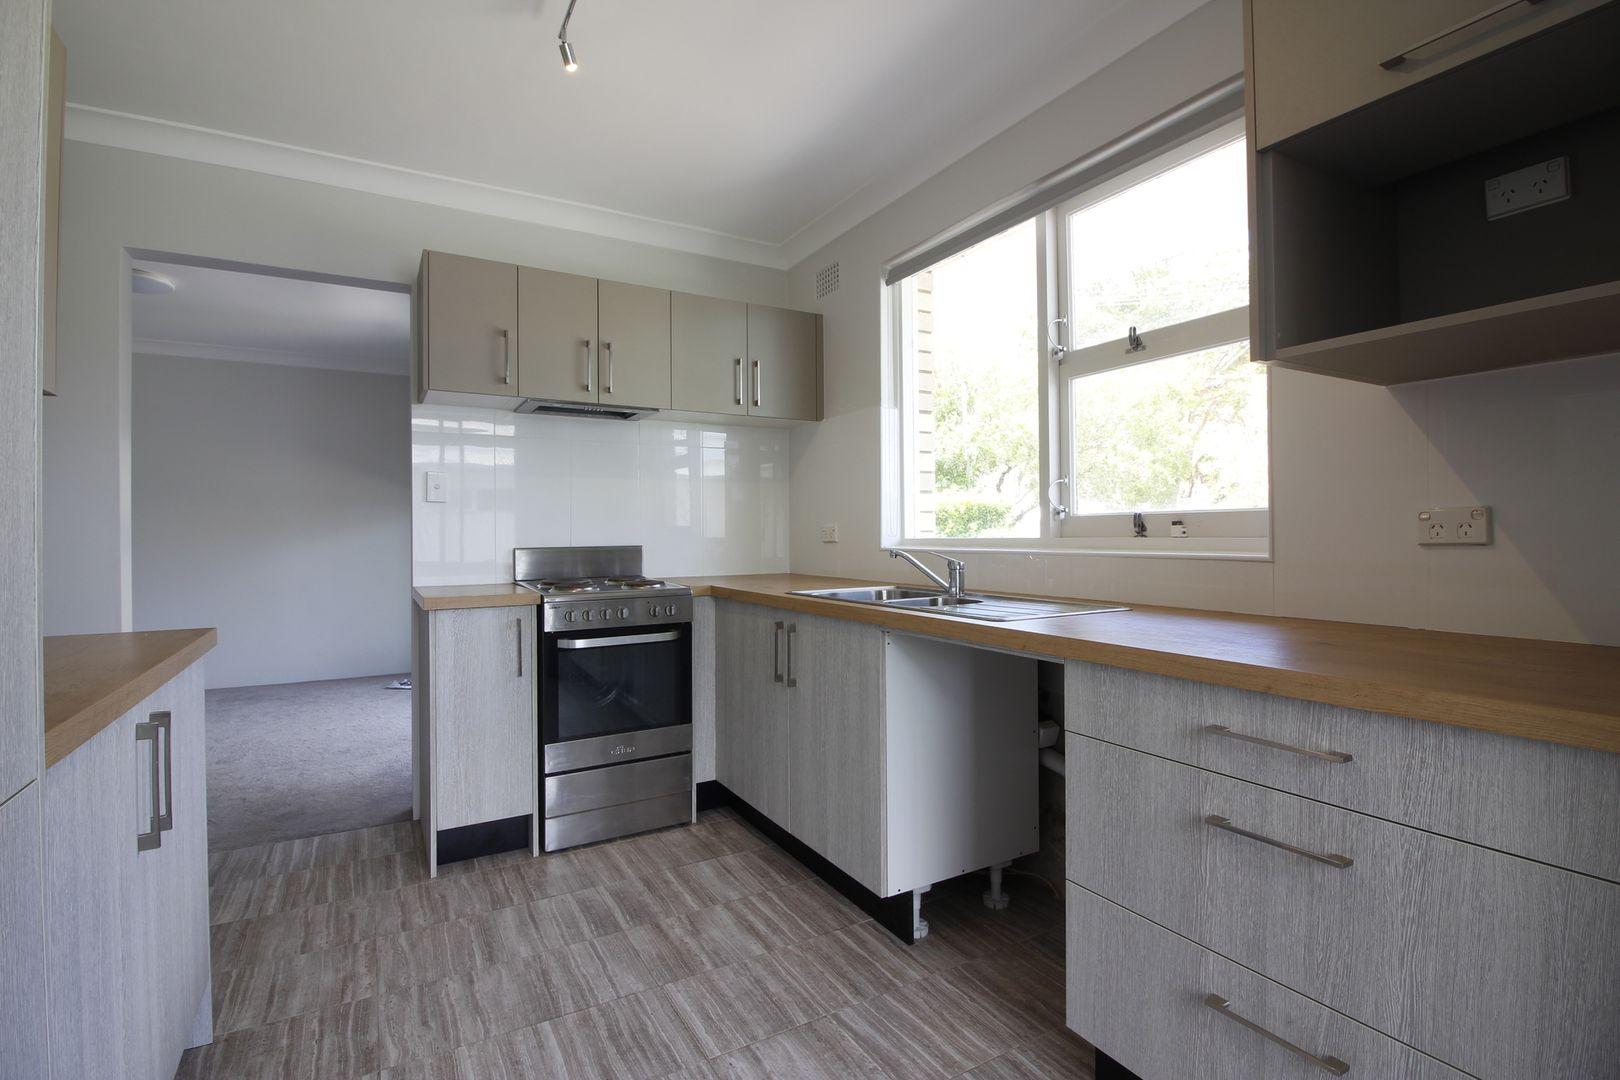 1/11 Boyle Street, Balgowlah NSW 2093, Image 1